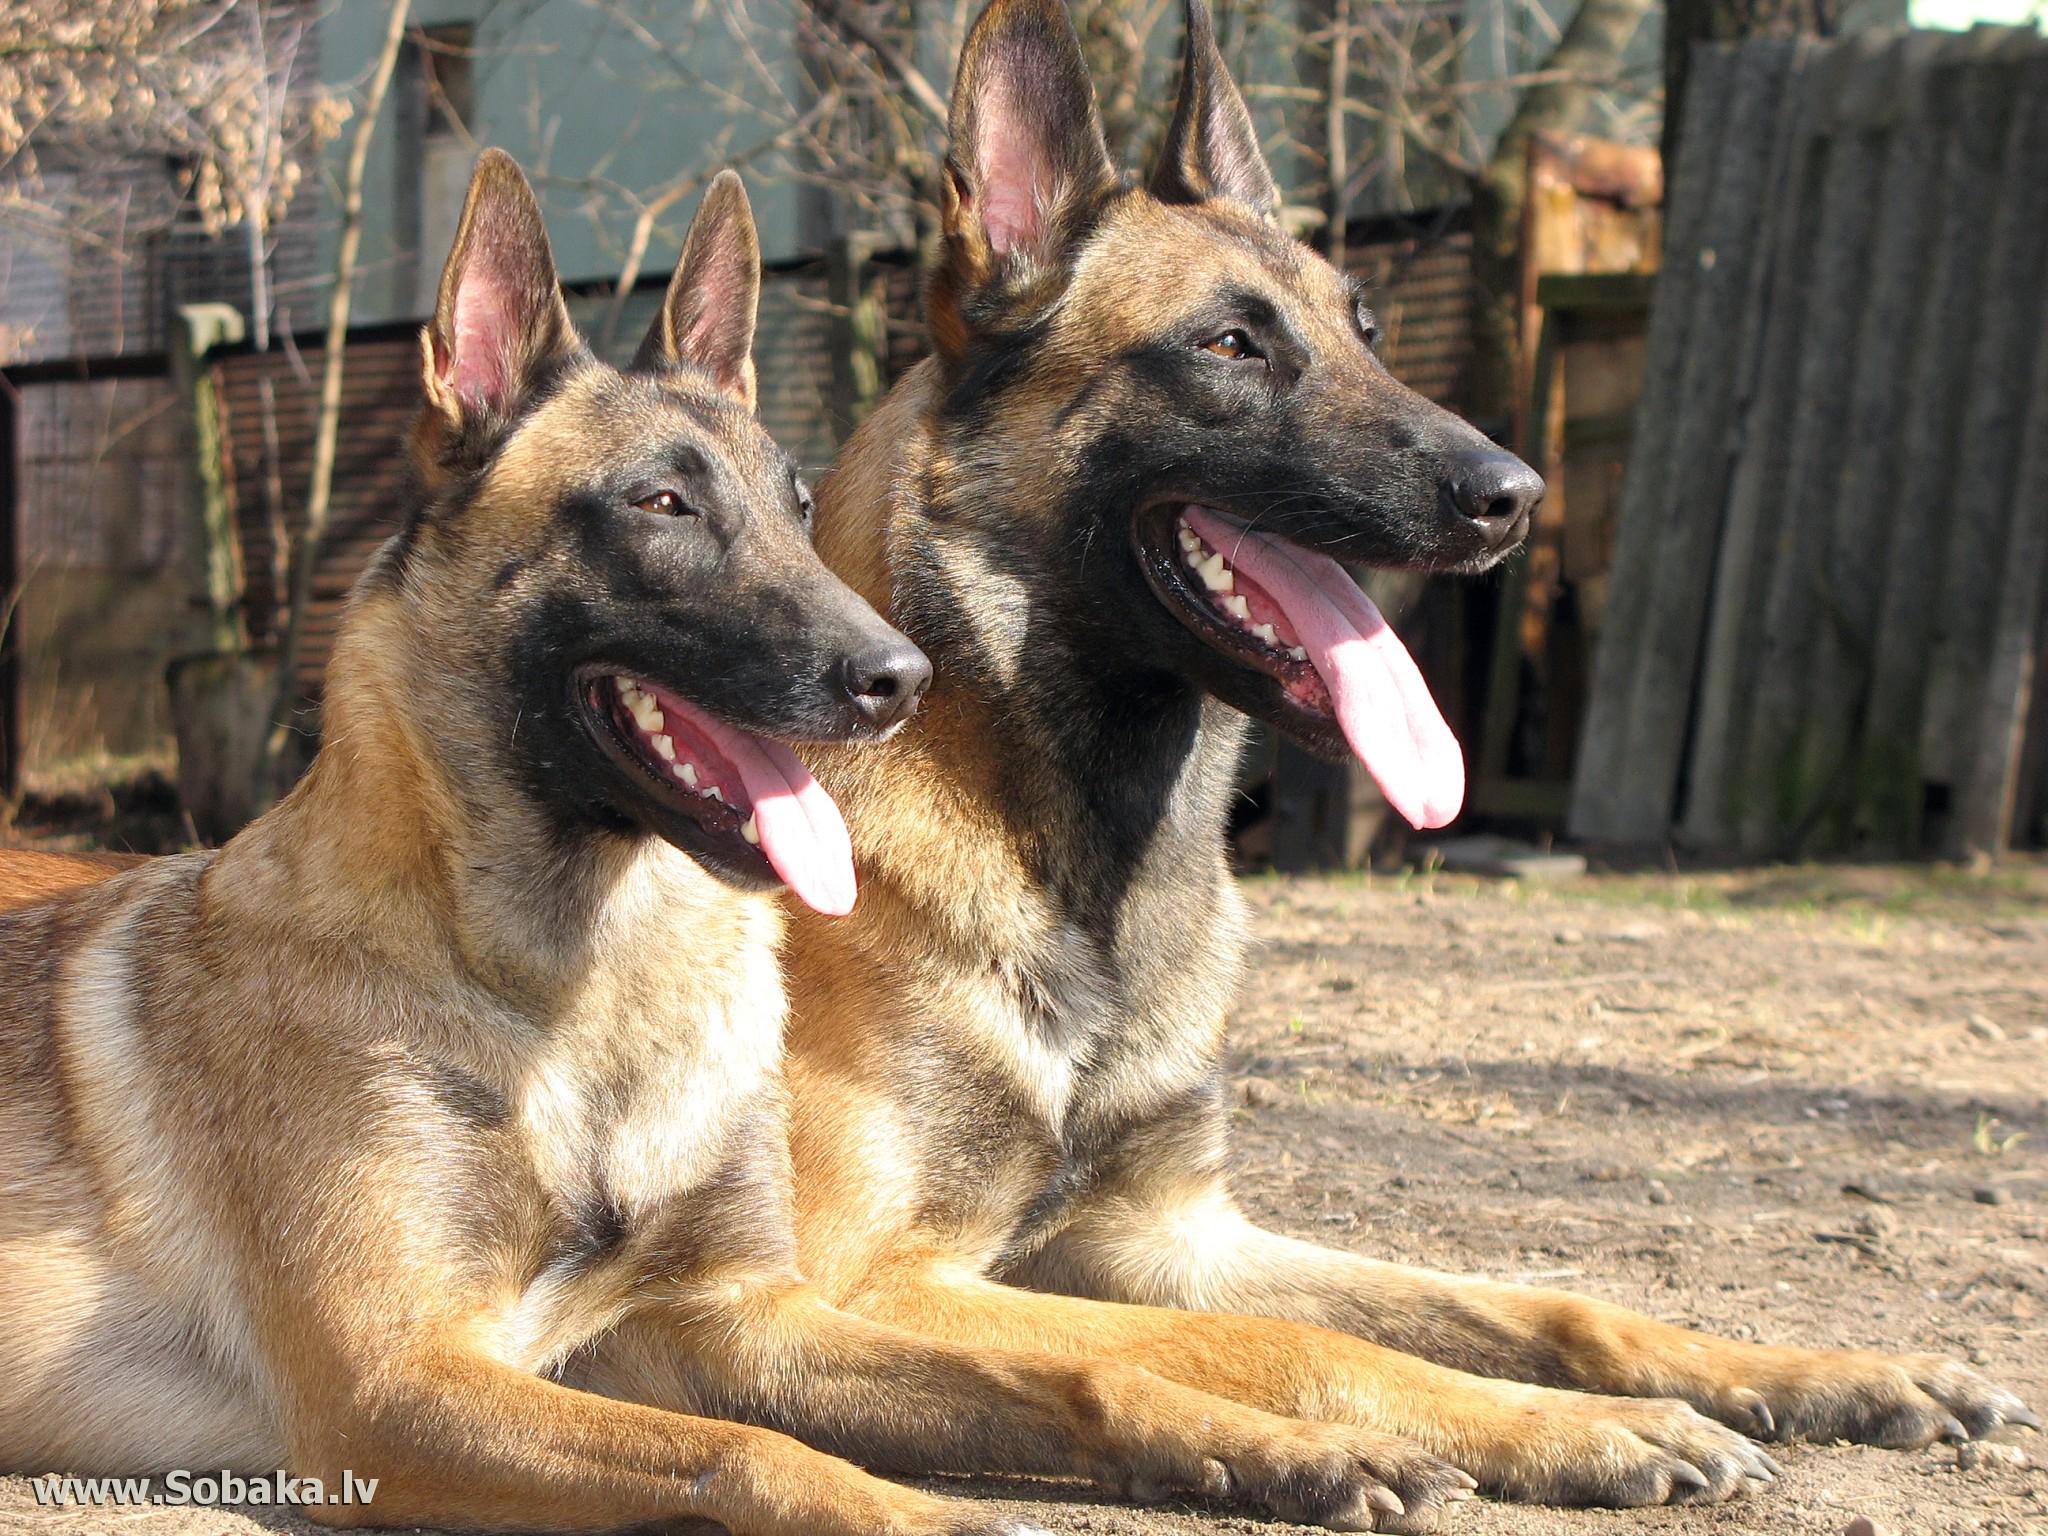 Малинуа фото собаки, Малинуа фото породы собак обои, Малинуа фото